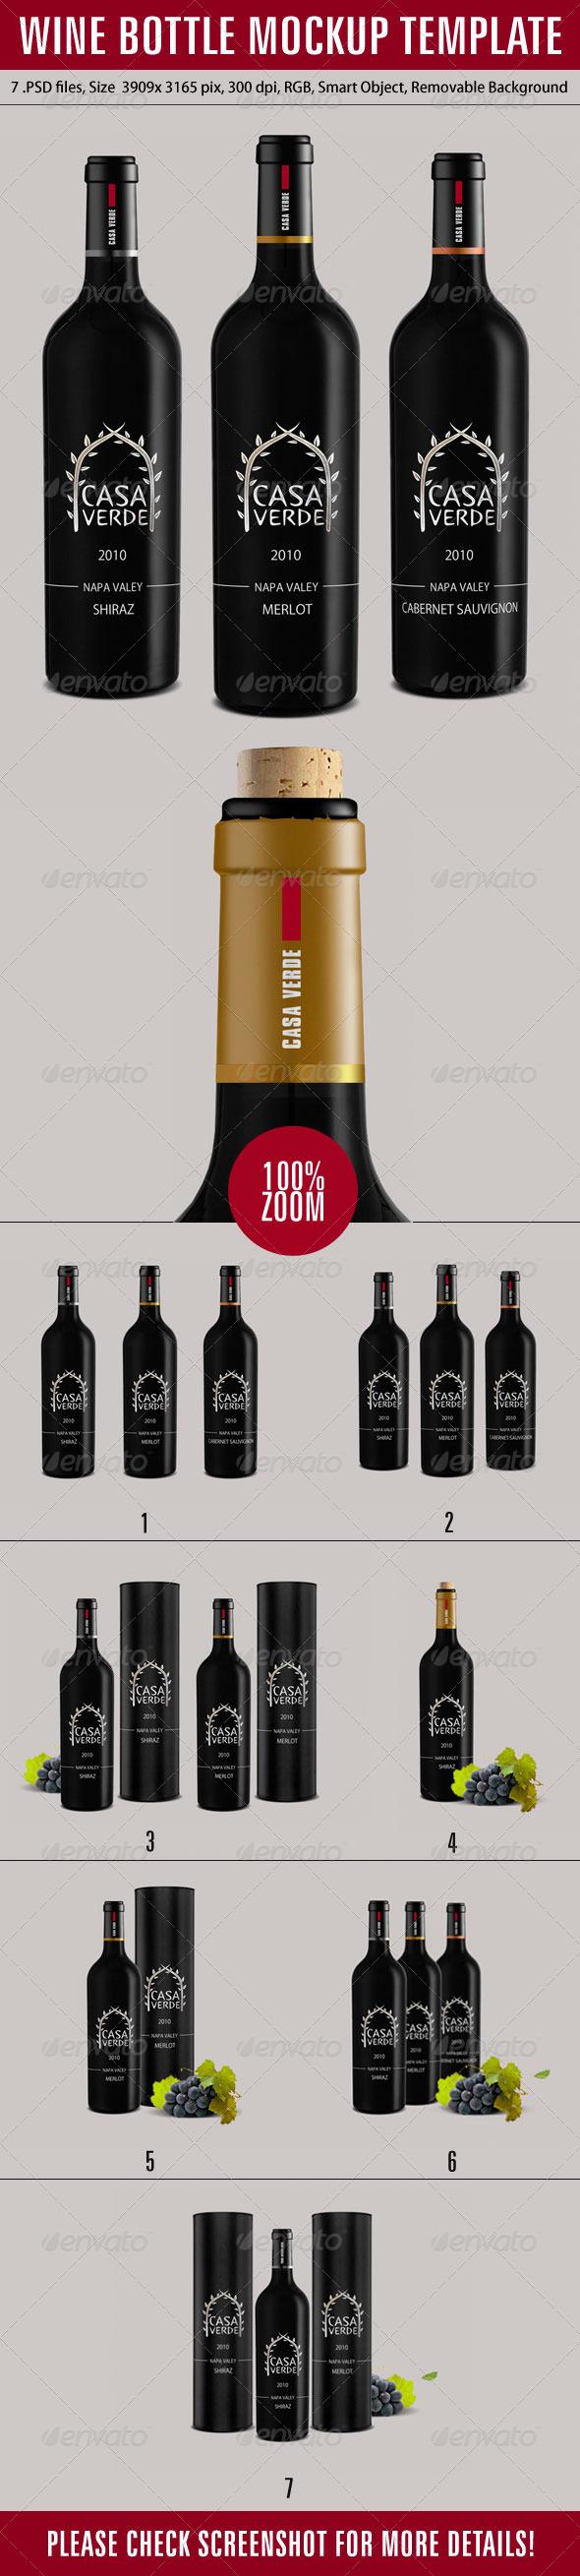 GraphicRiver Wine Bottle Mockup Template 6573257